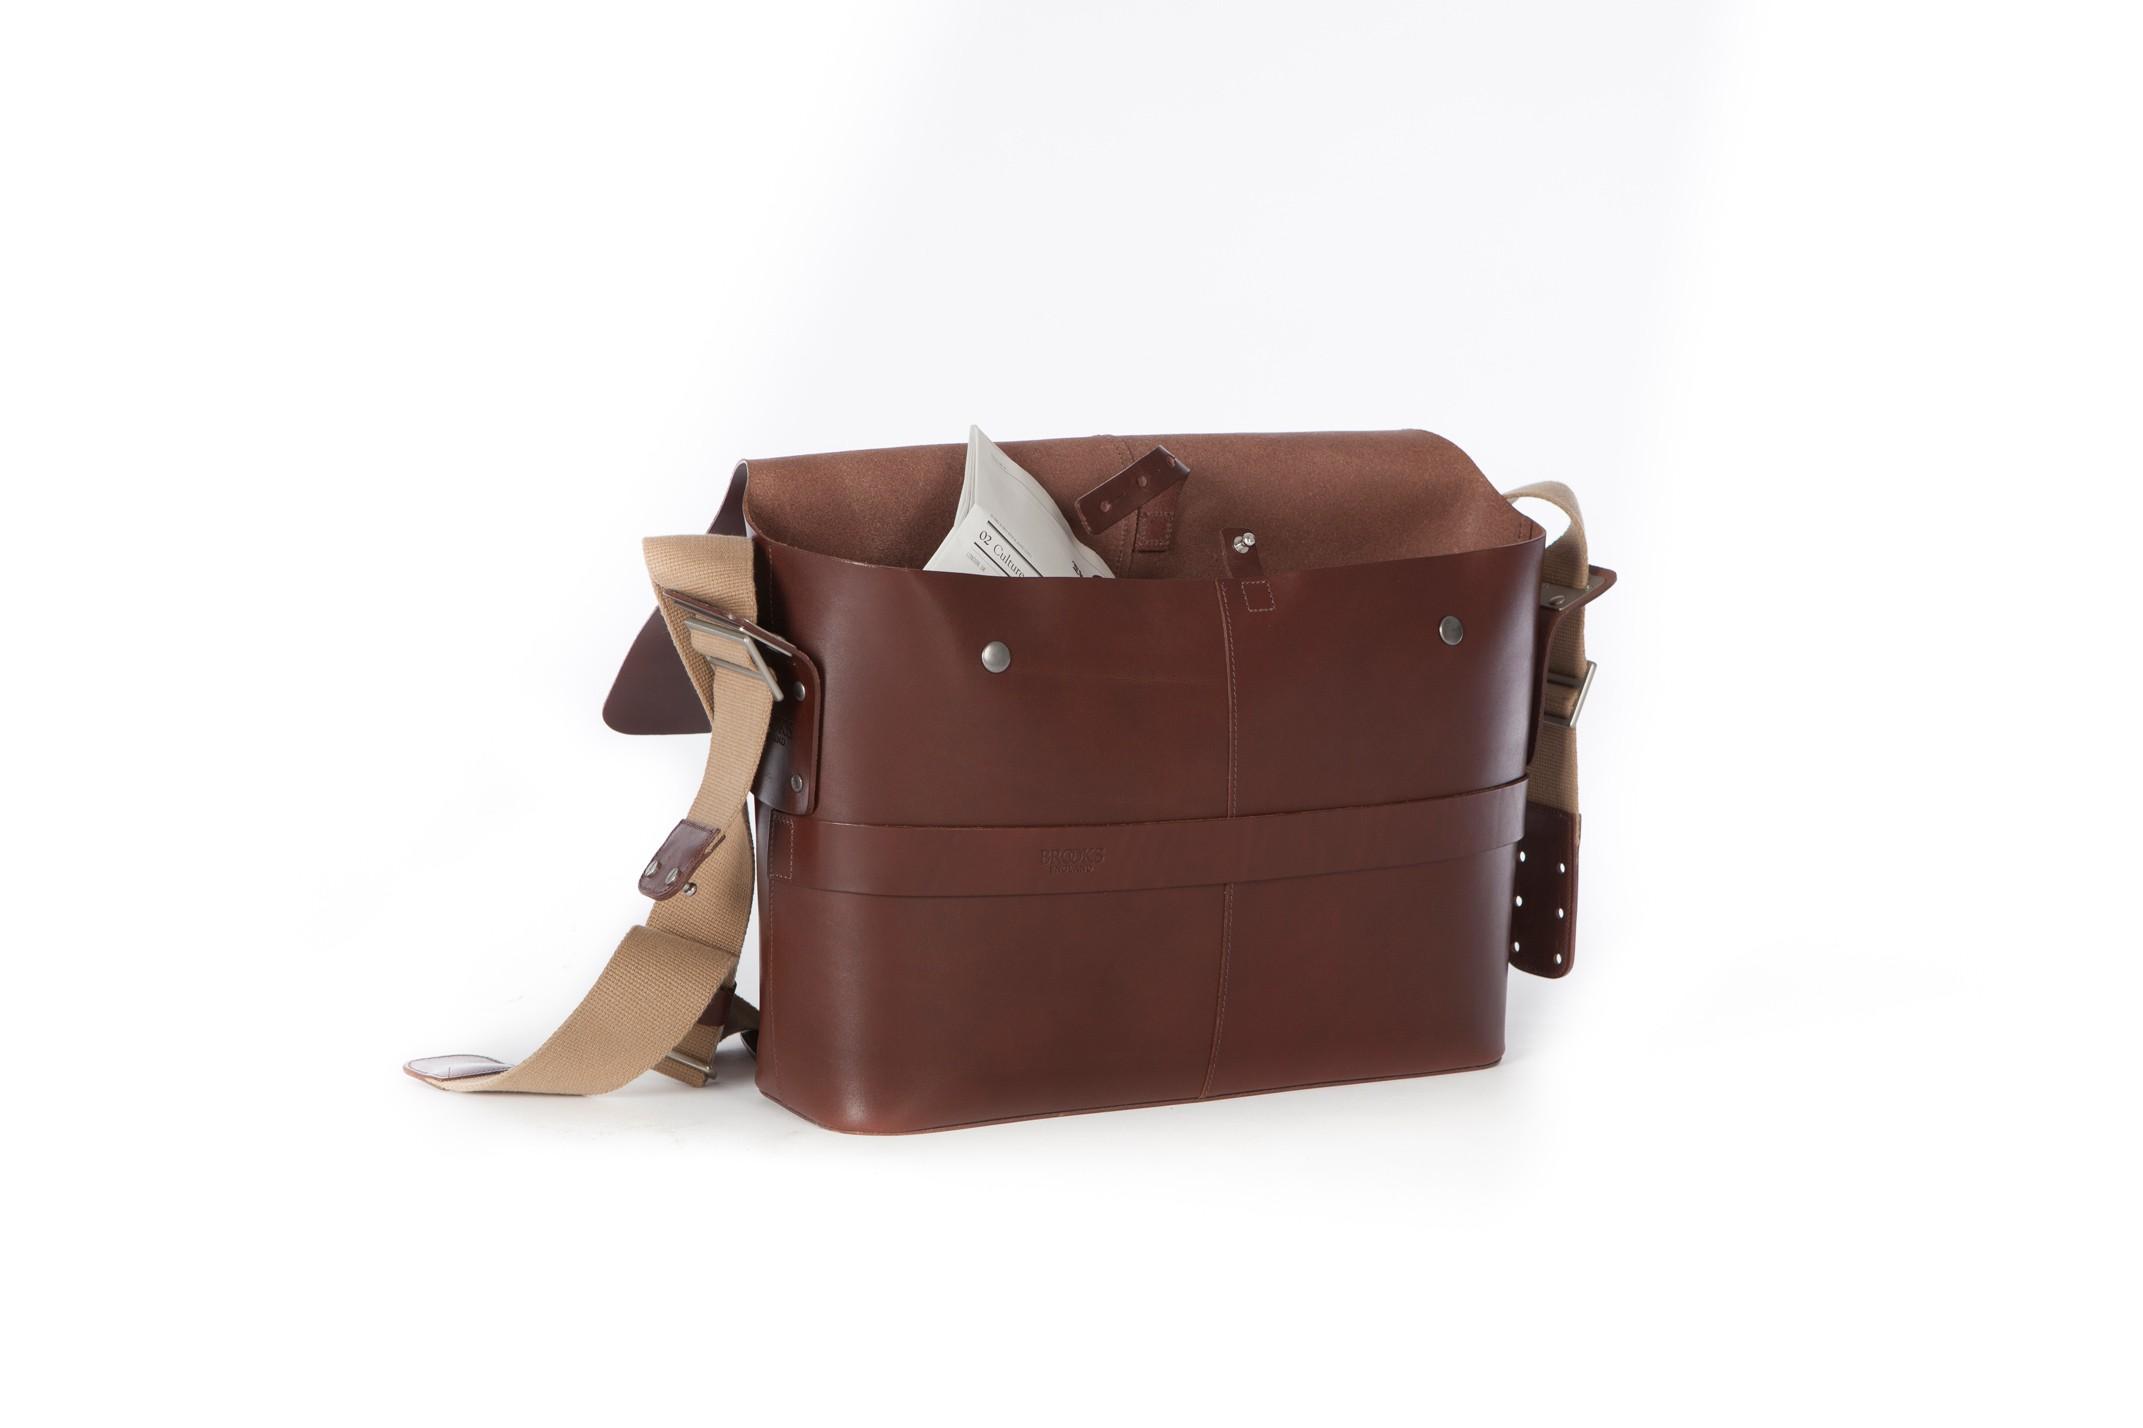 saddlebag briefcase photo - 1